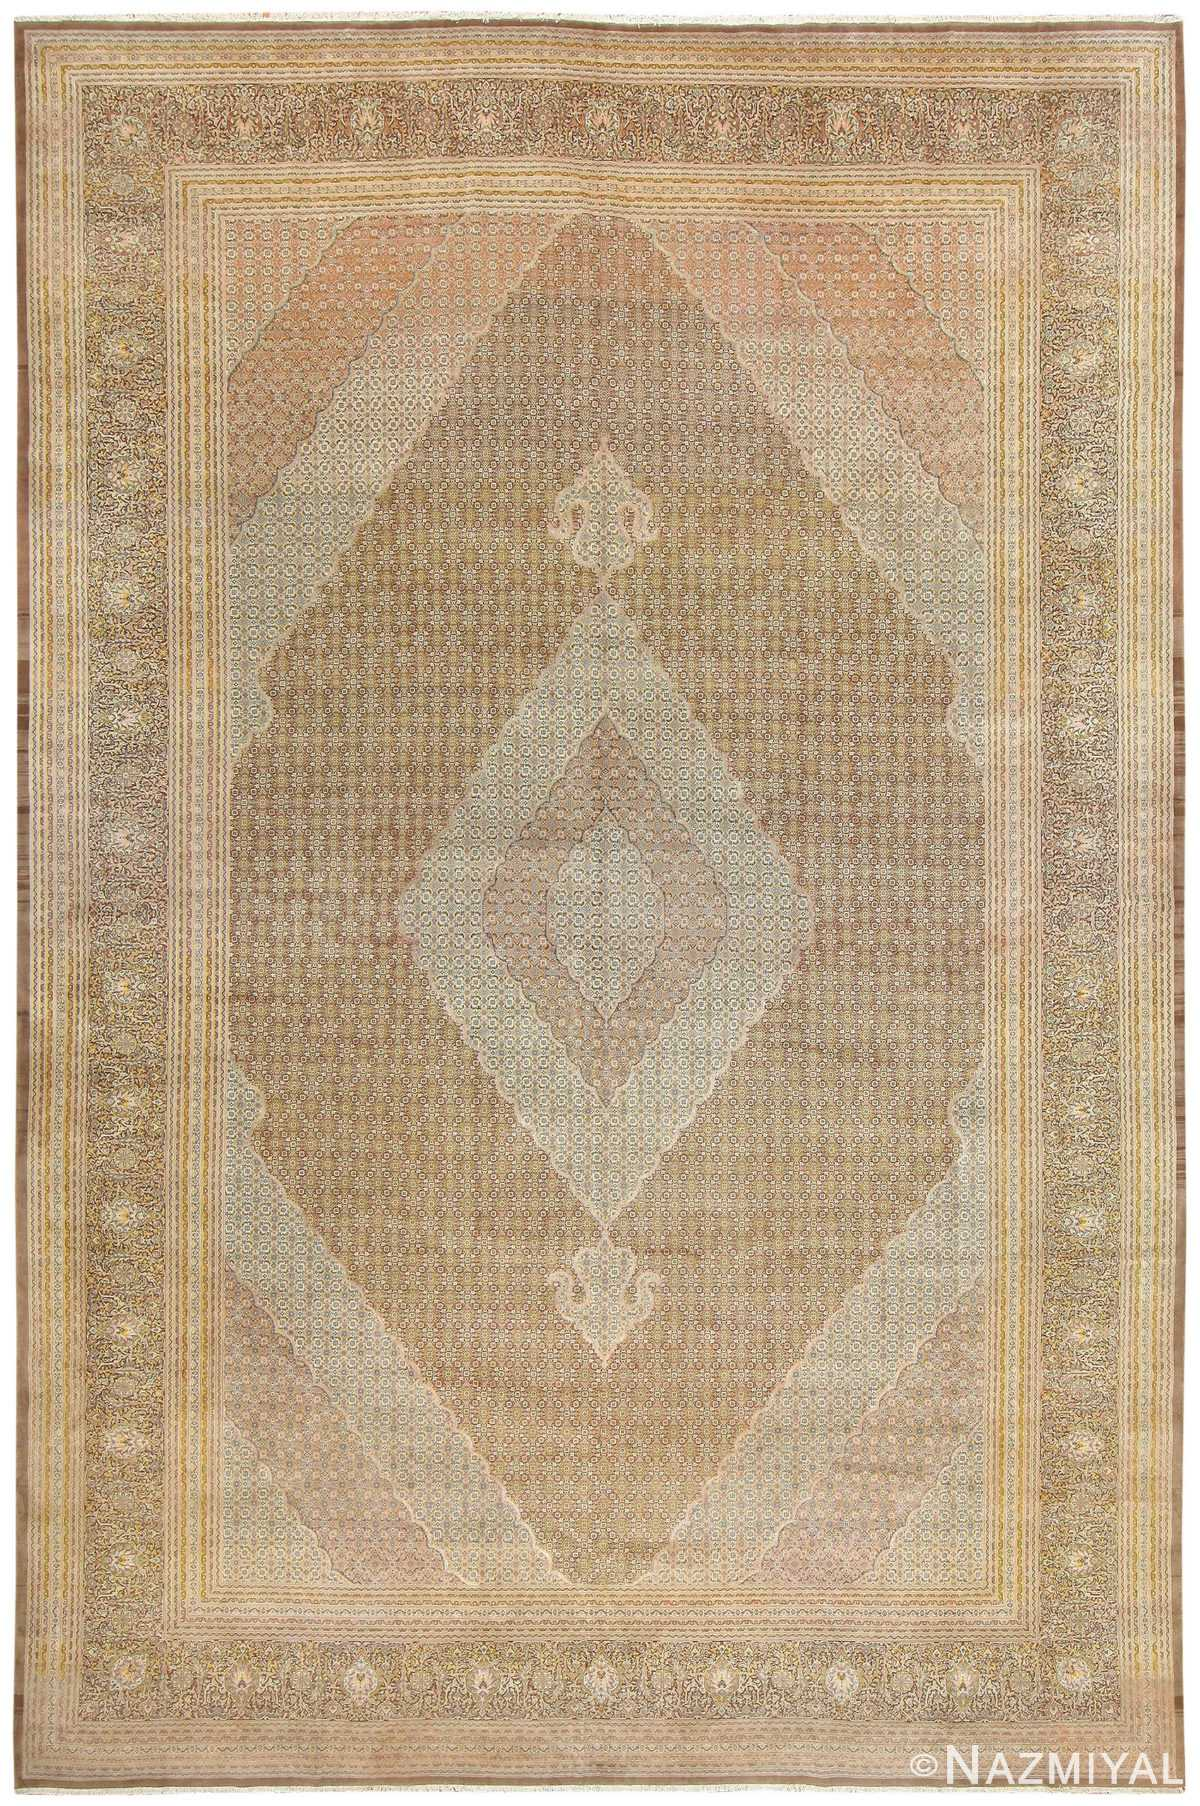 Persian Tabriz Carpet 50317 Detail/Large View